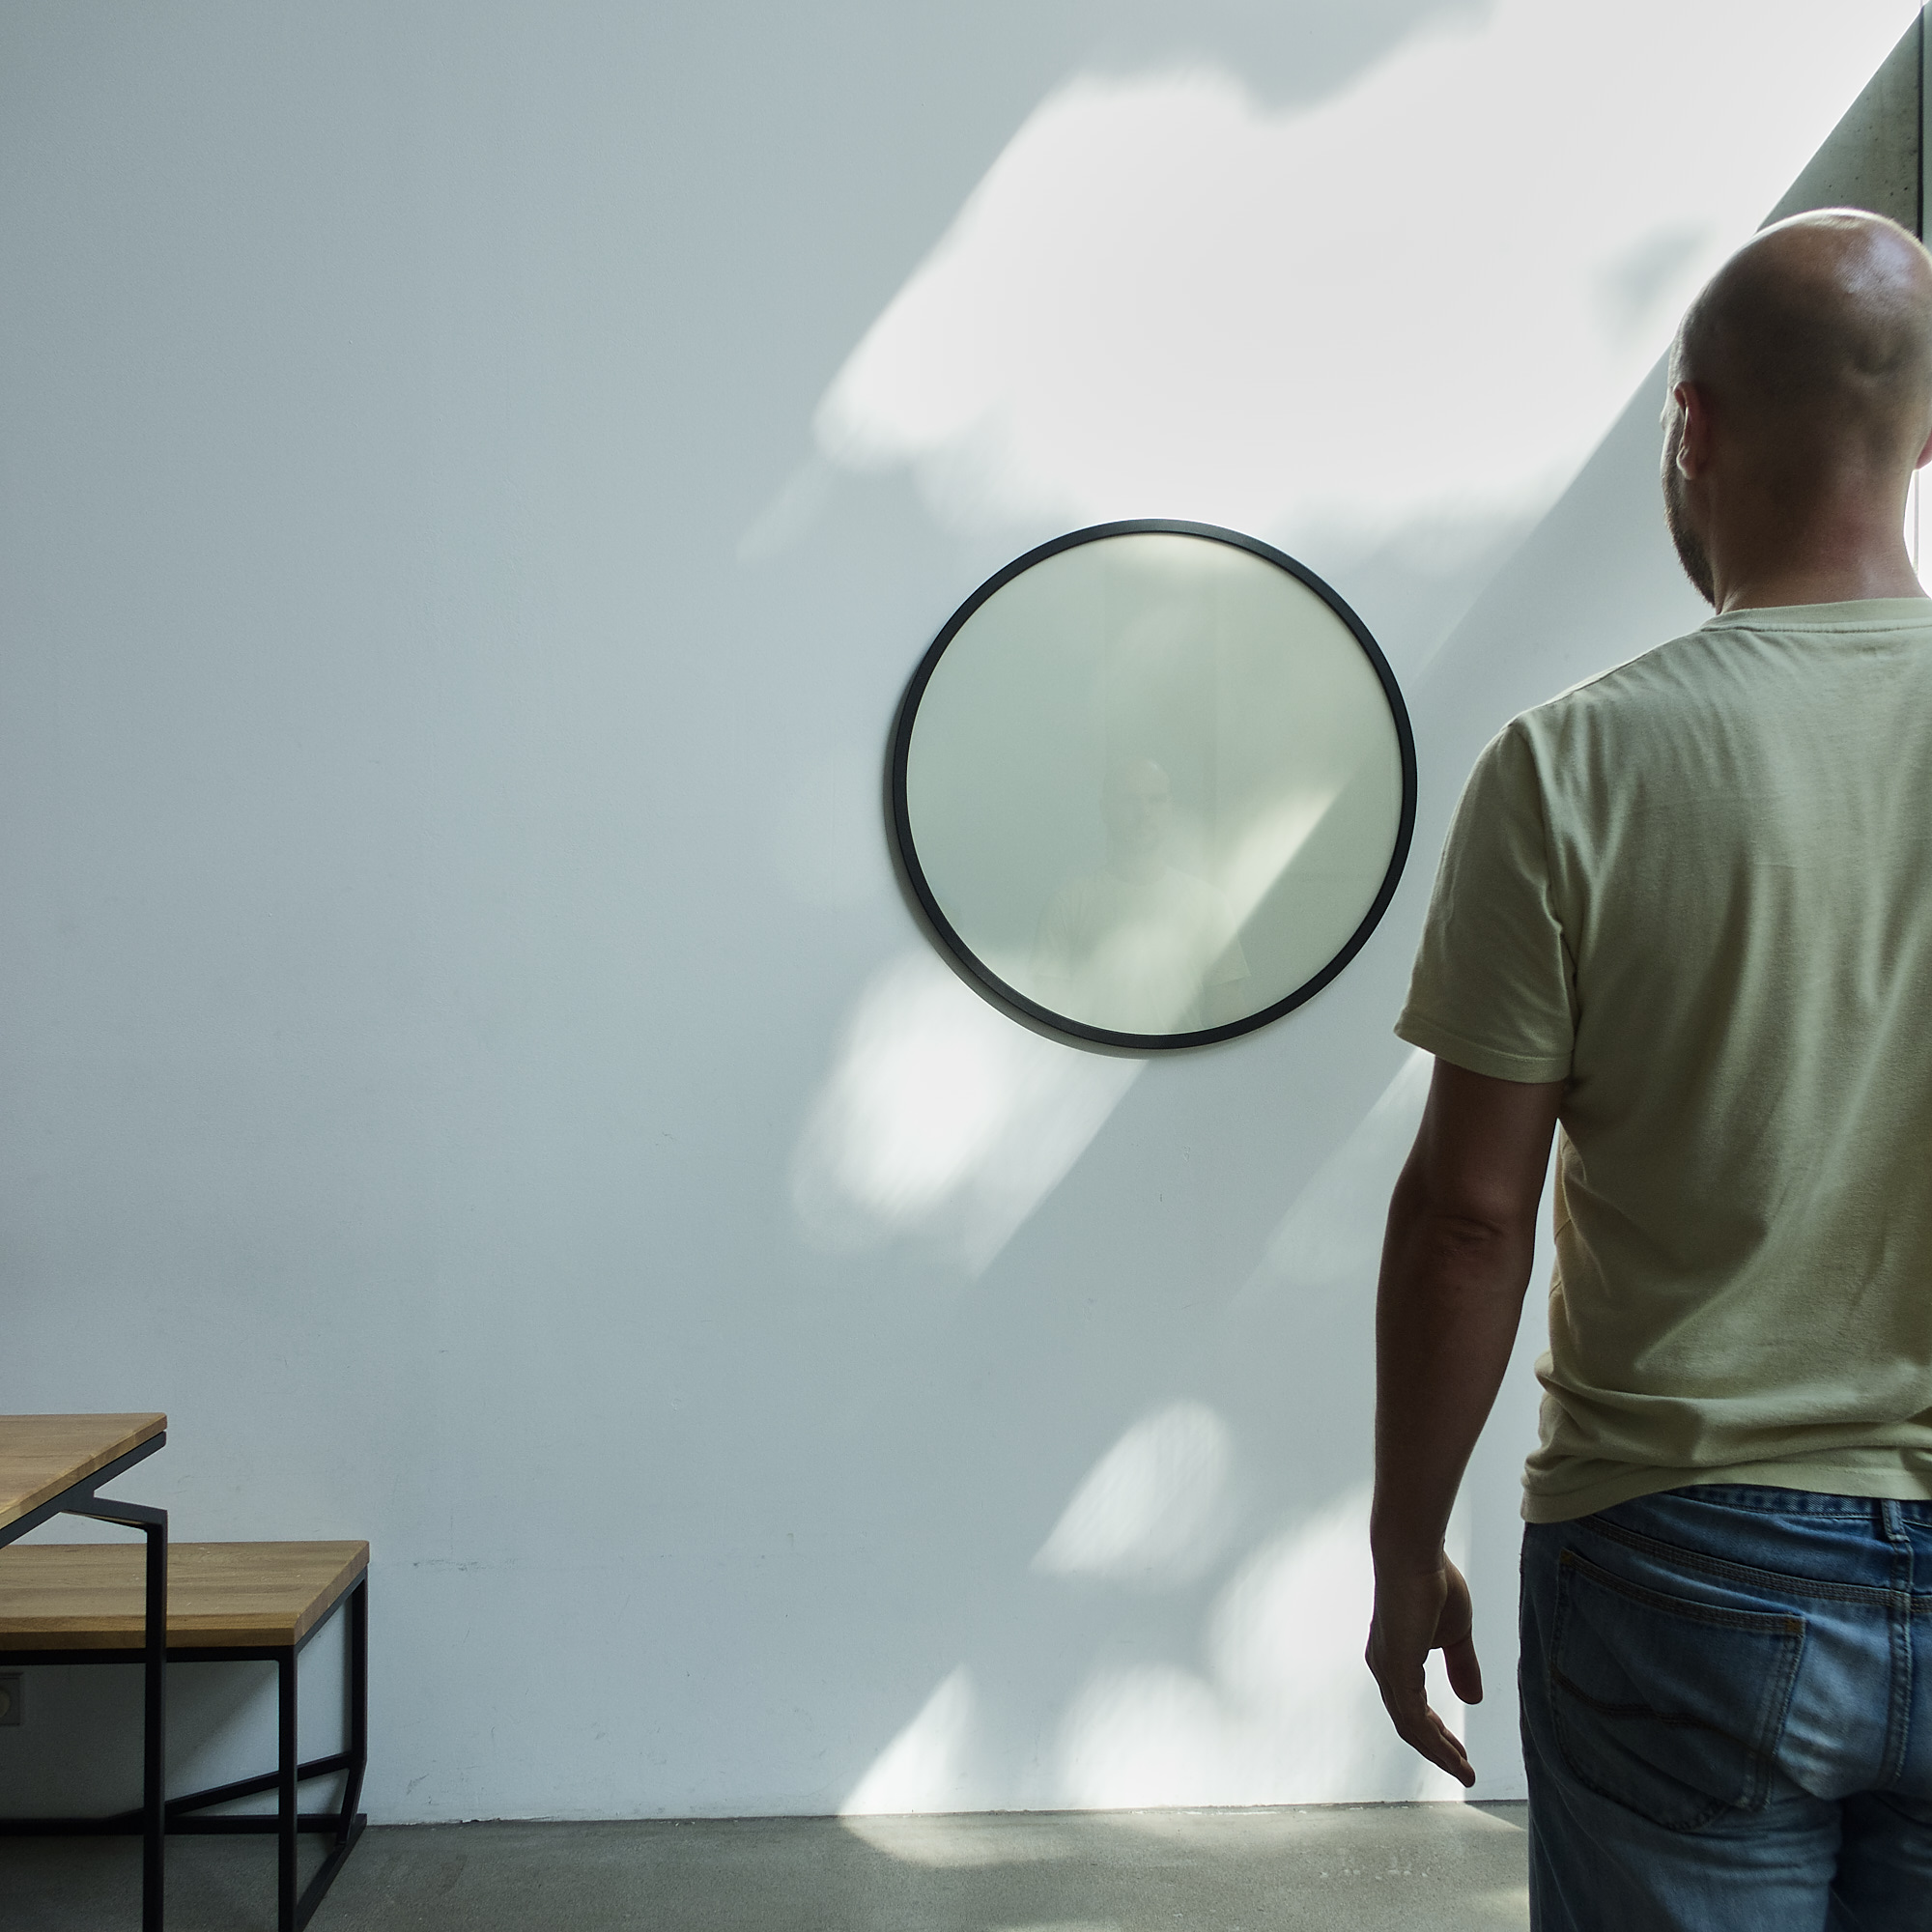 rlon-pranayama-kinetic-art-installation-1566.jpg